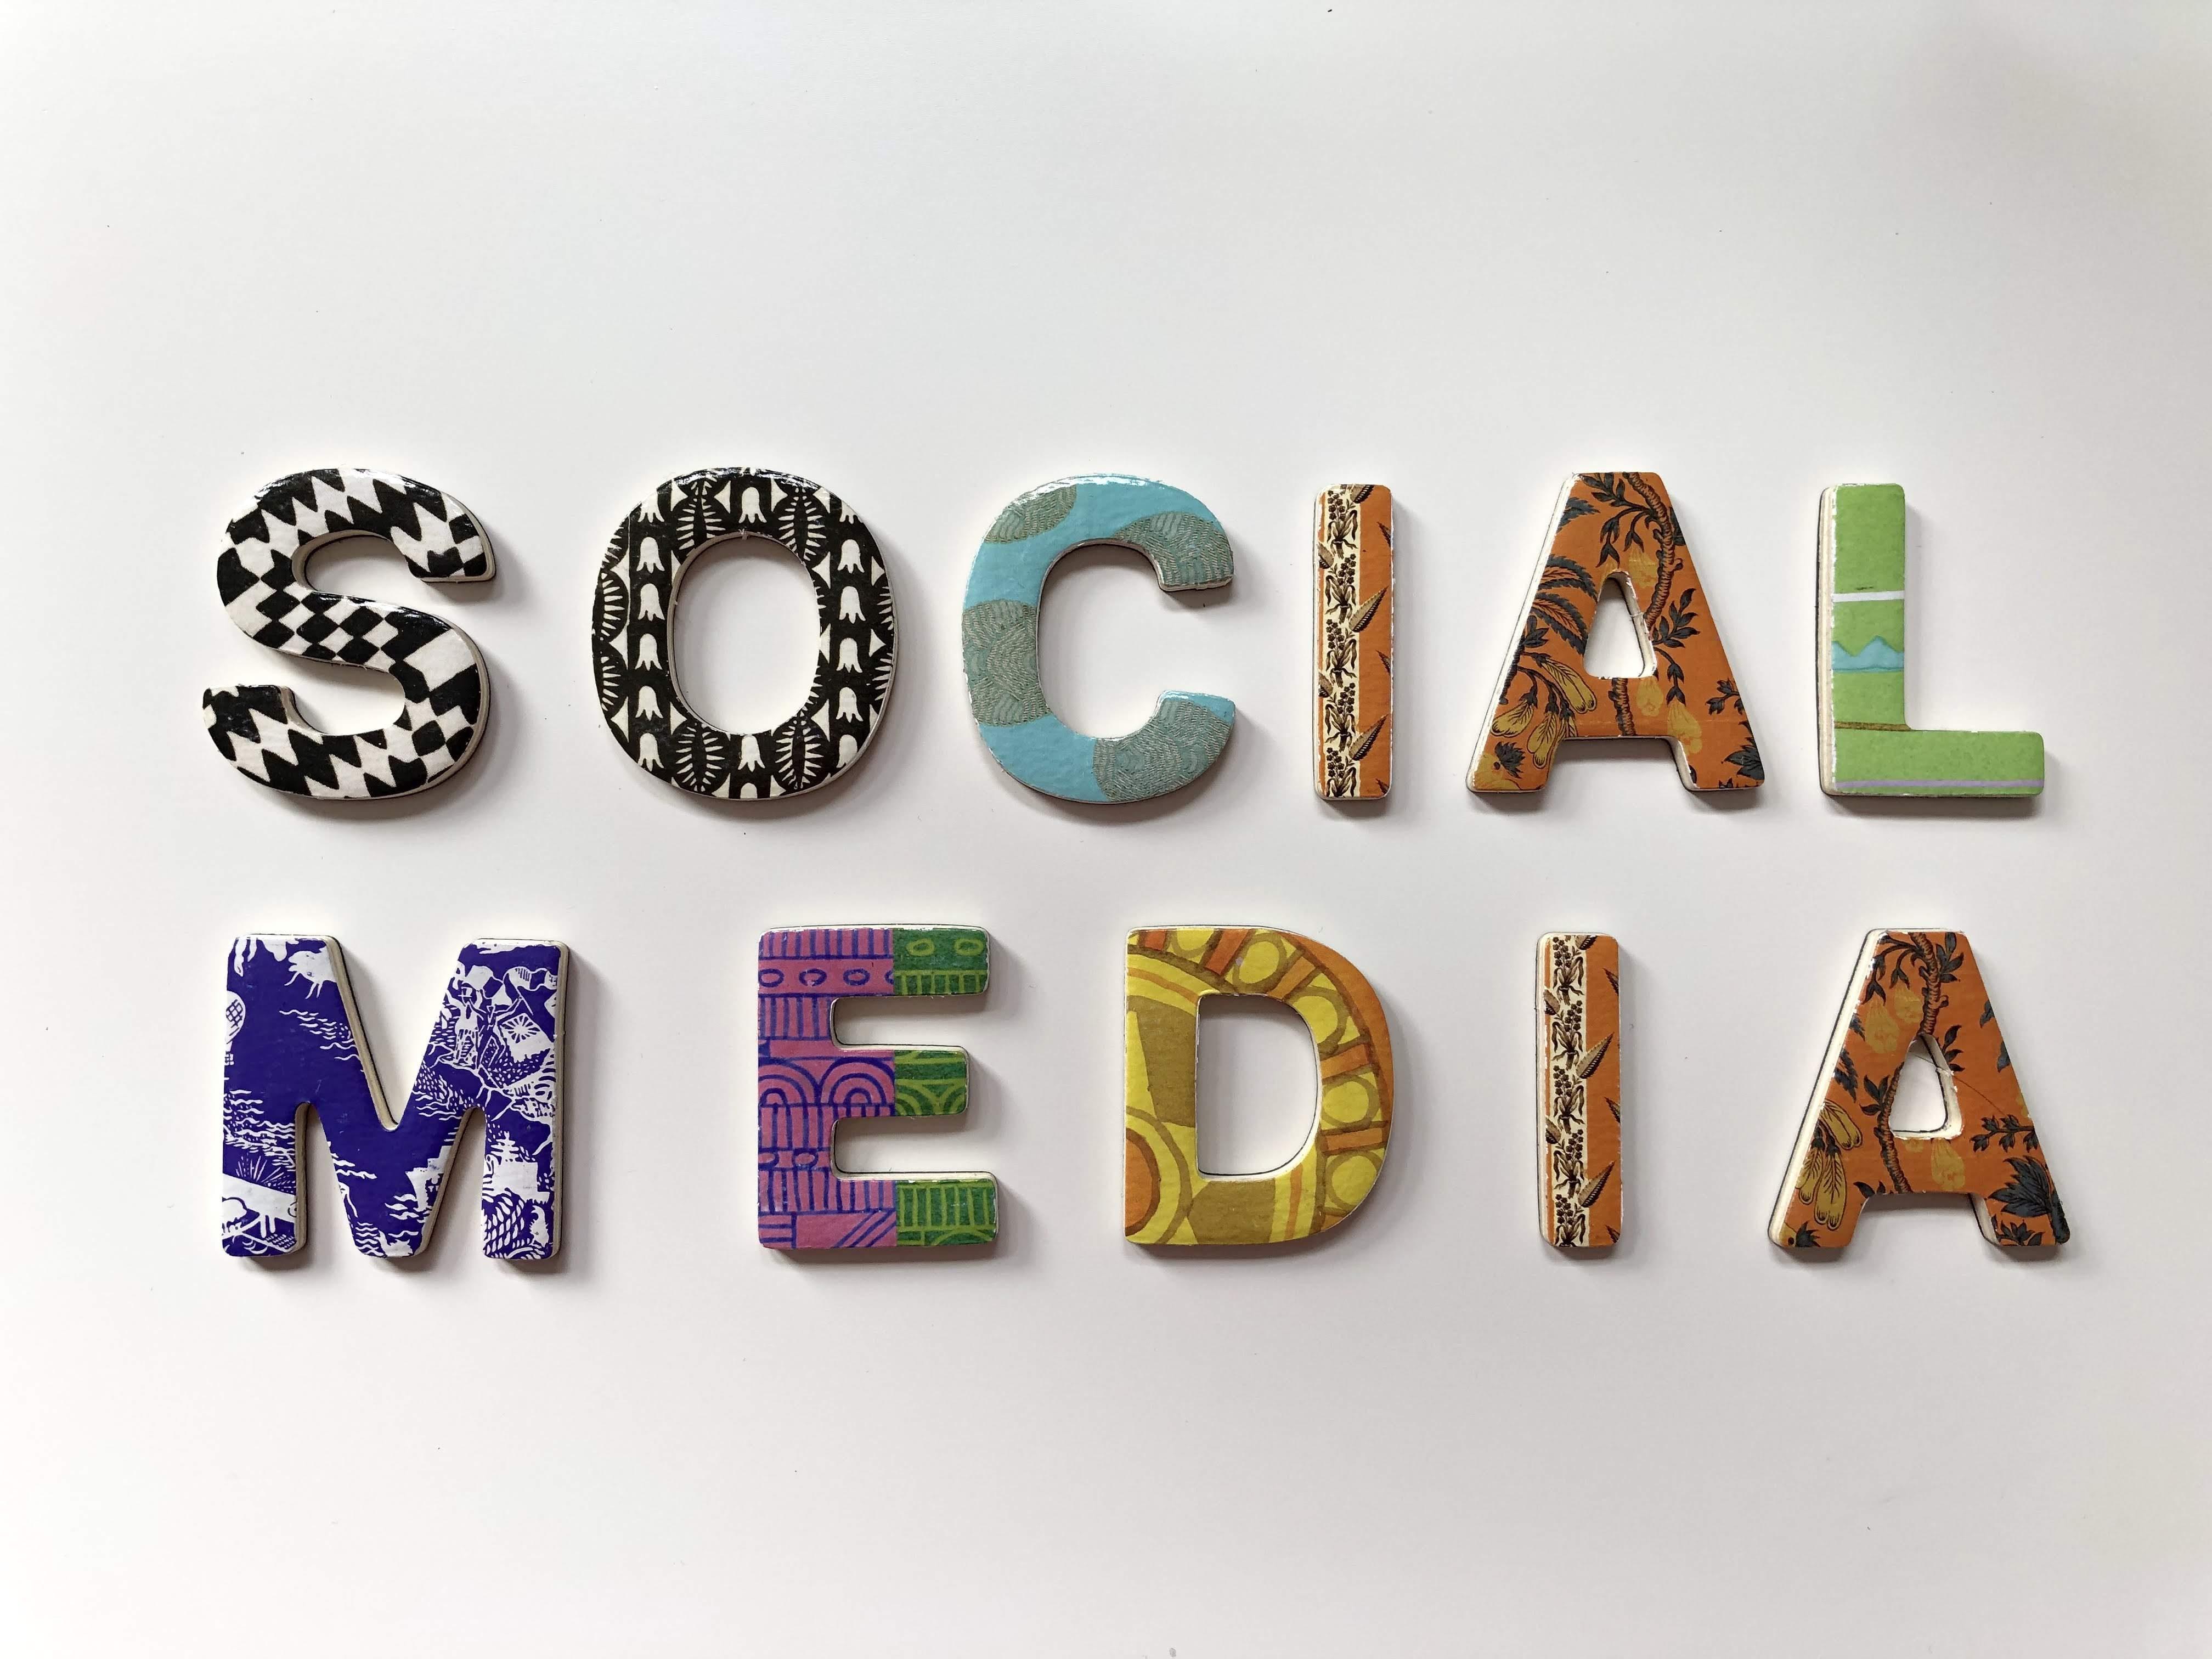 Best Social Media Sites To Generate Traffic in 2020